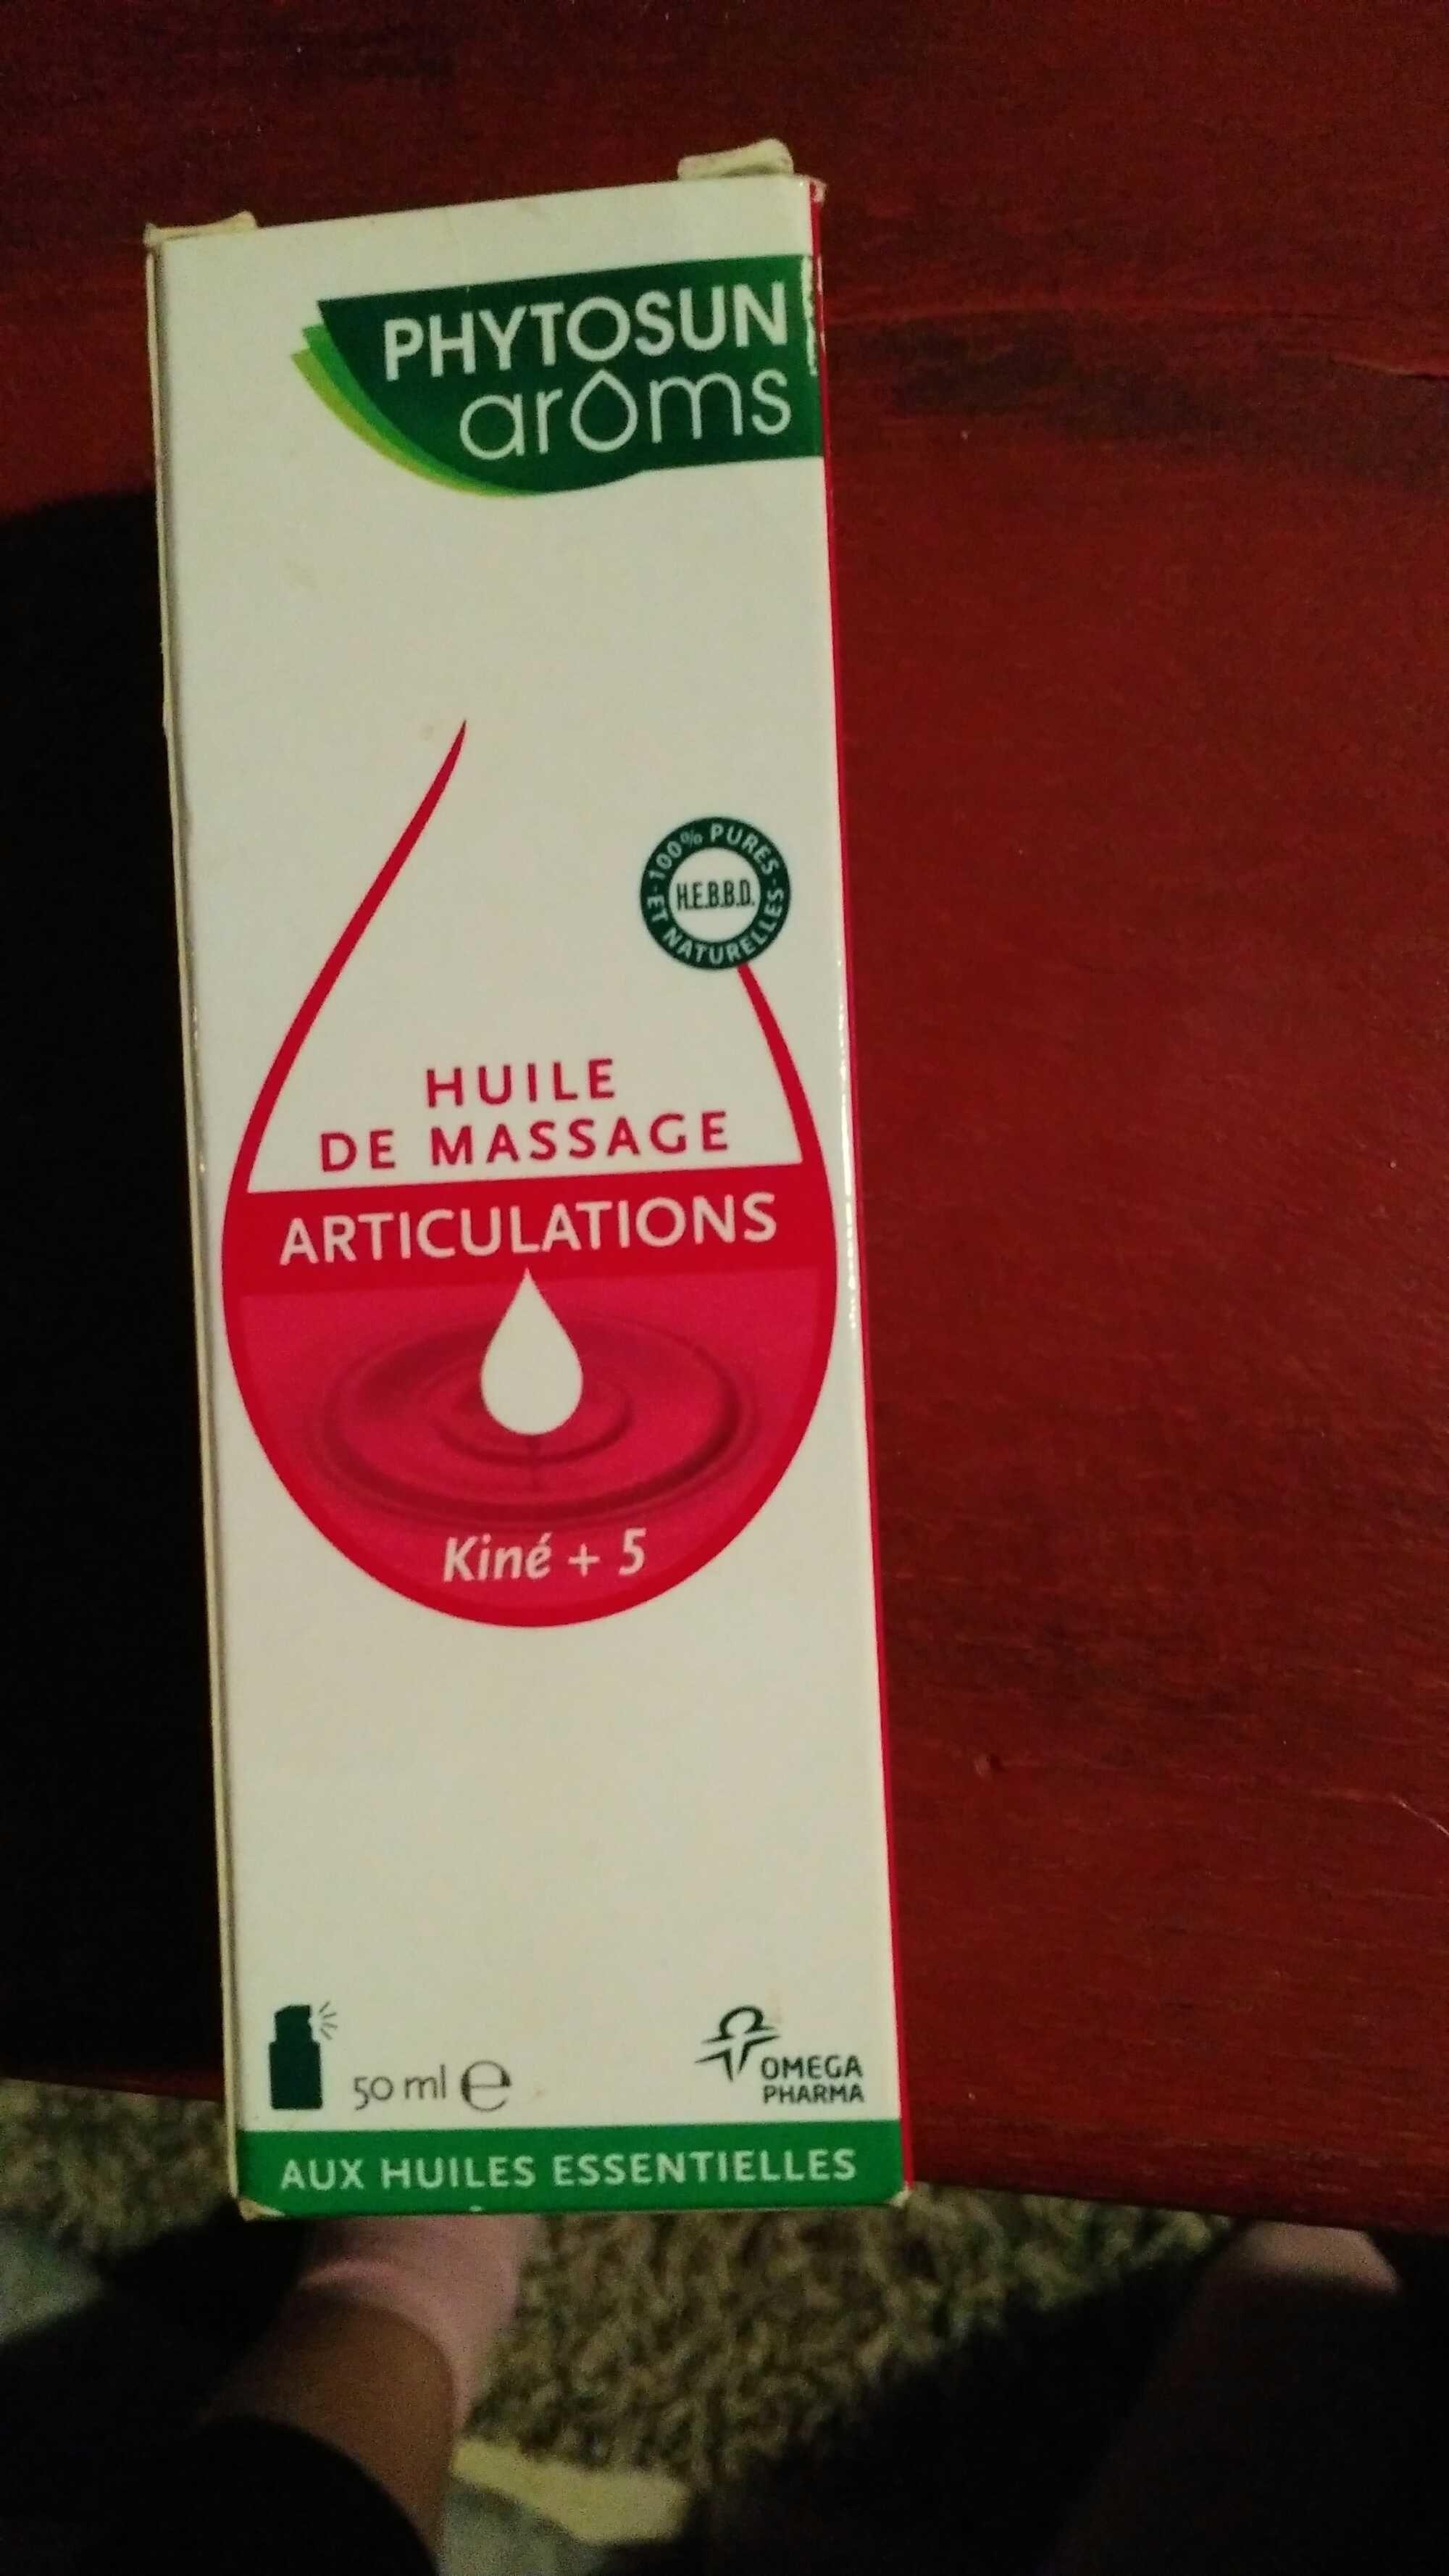 Huile de massage articulations - Product - fr